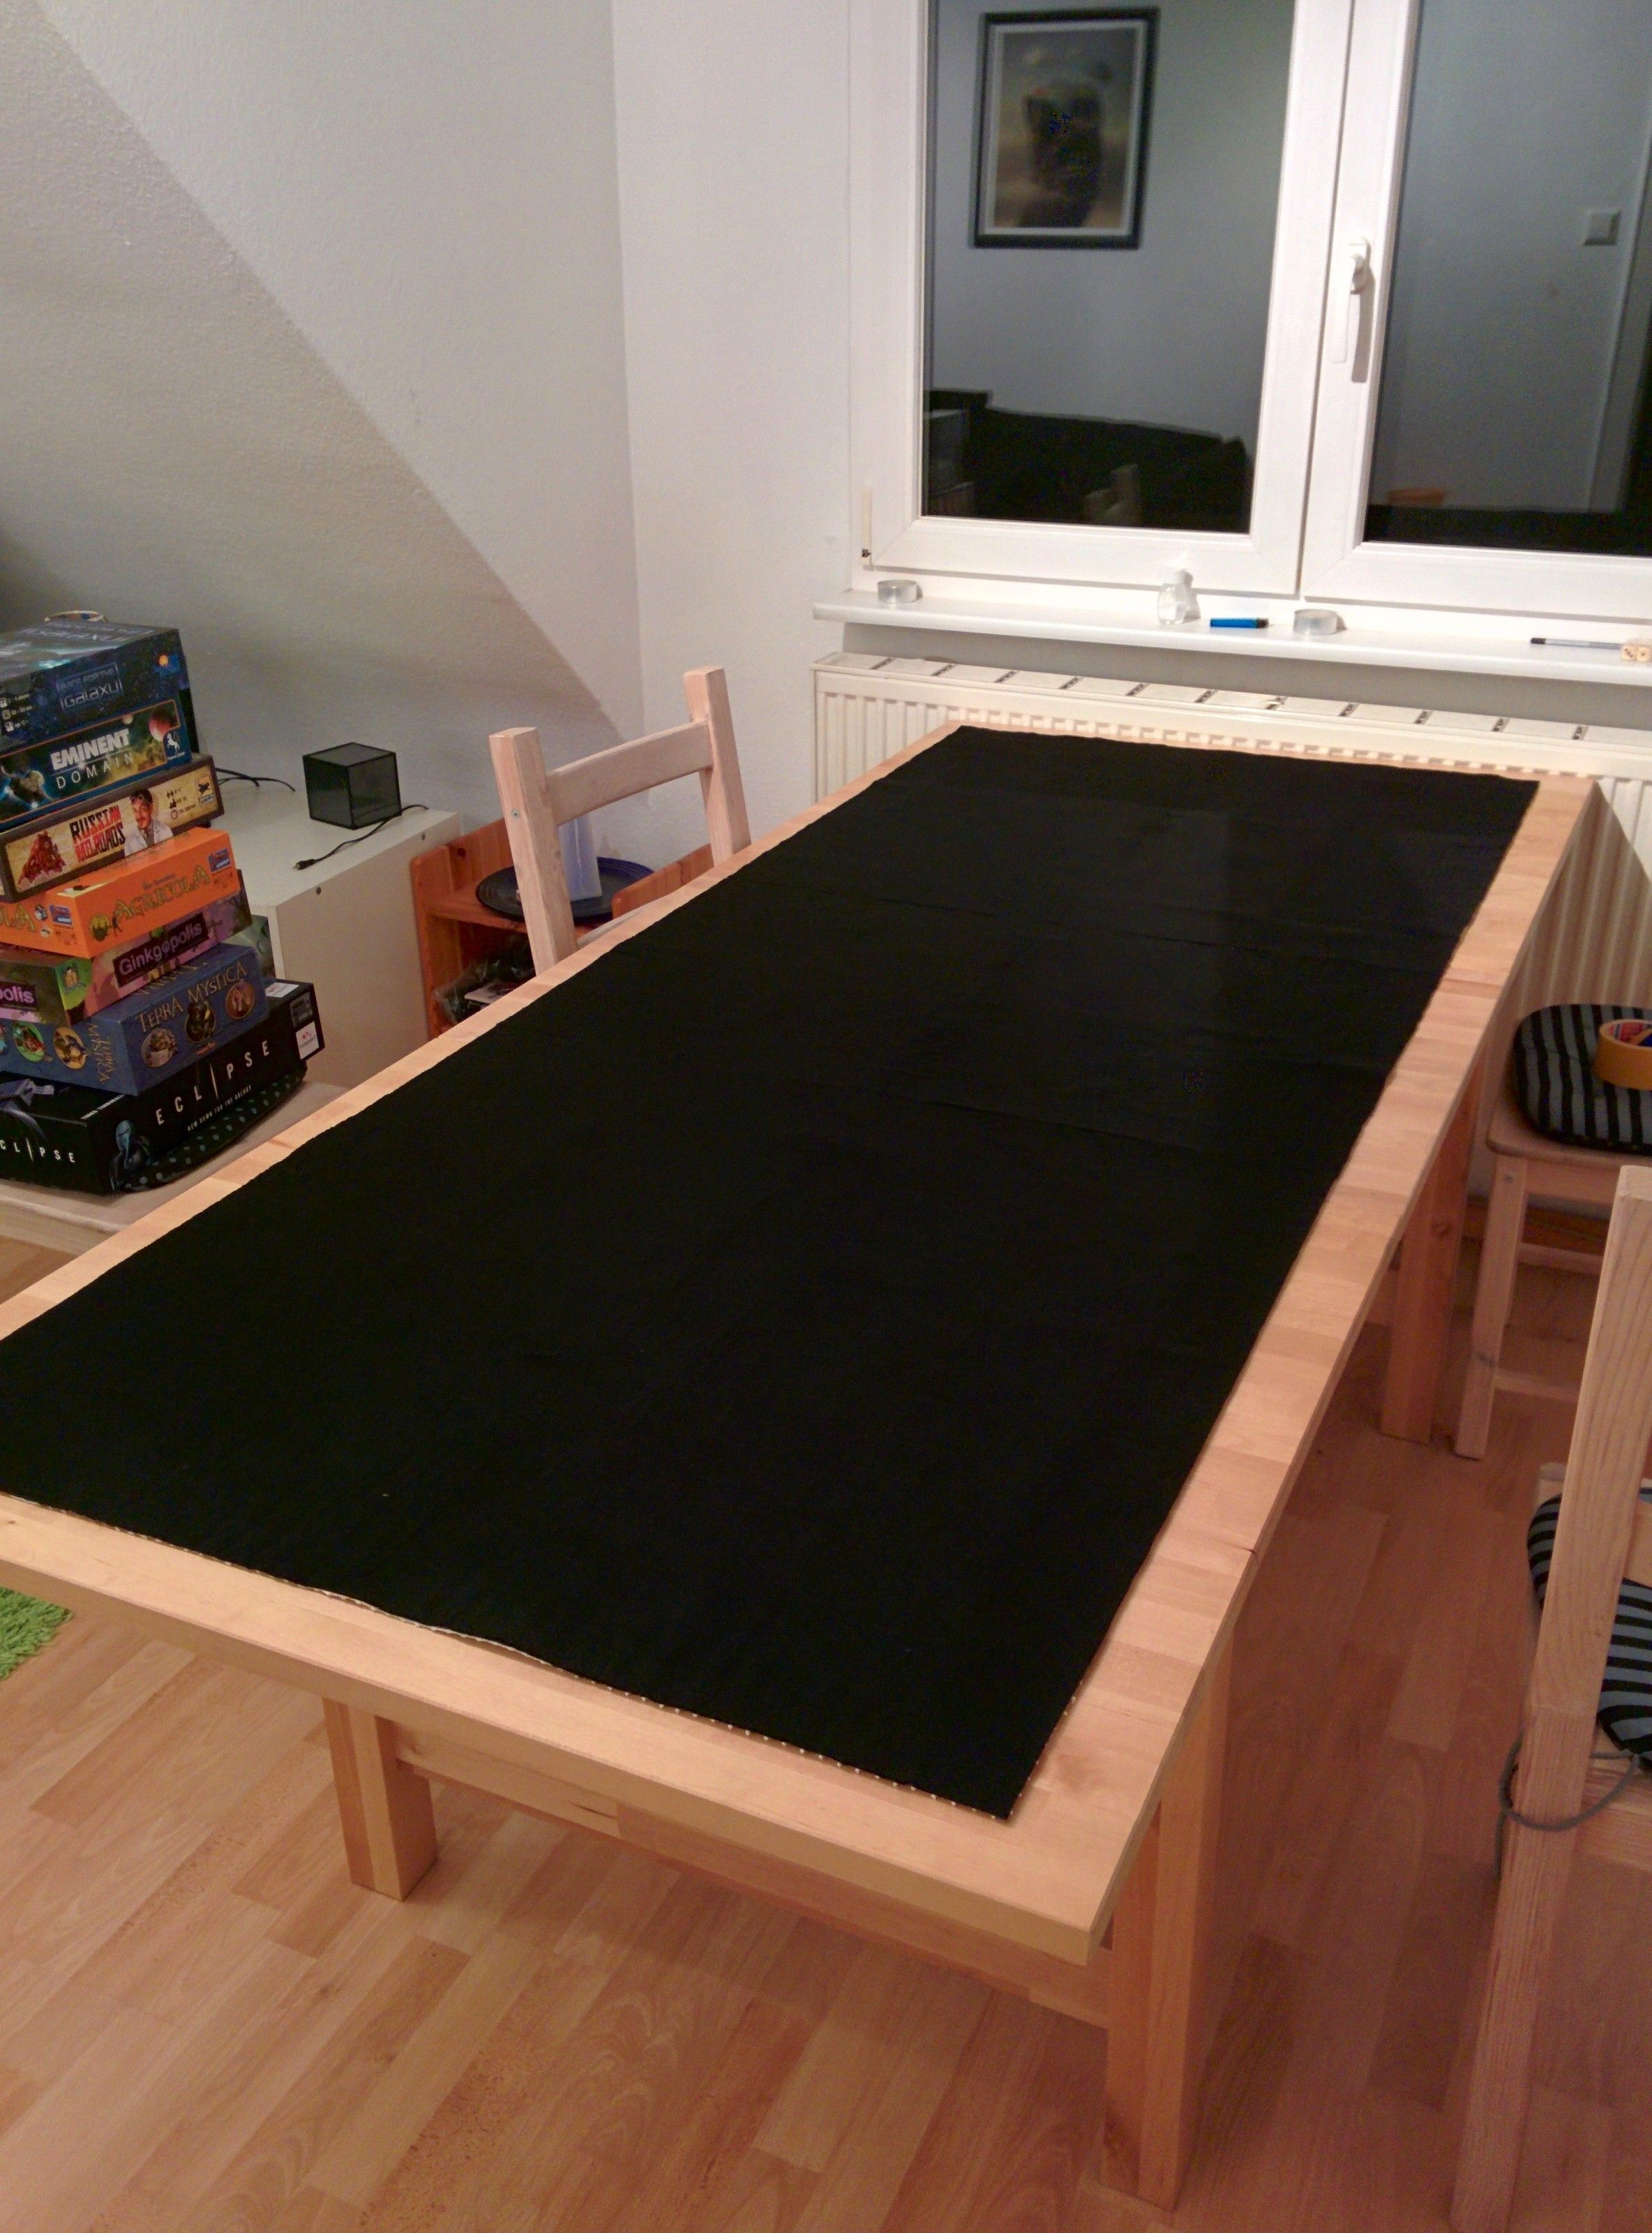 Diy Anti Slip Felt Boardgaming Mat Boardgamegeek Boardgamegeek Diy Felt Games Felt